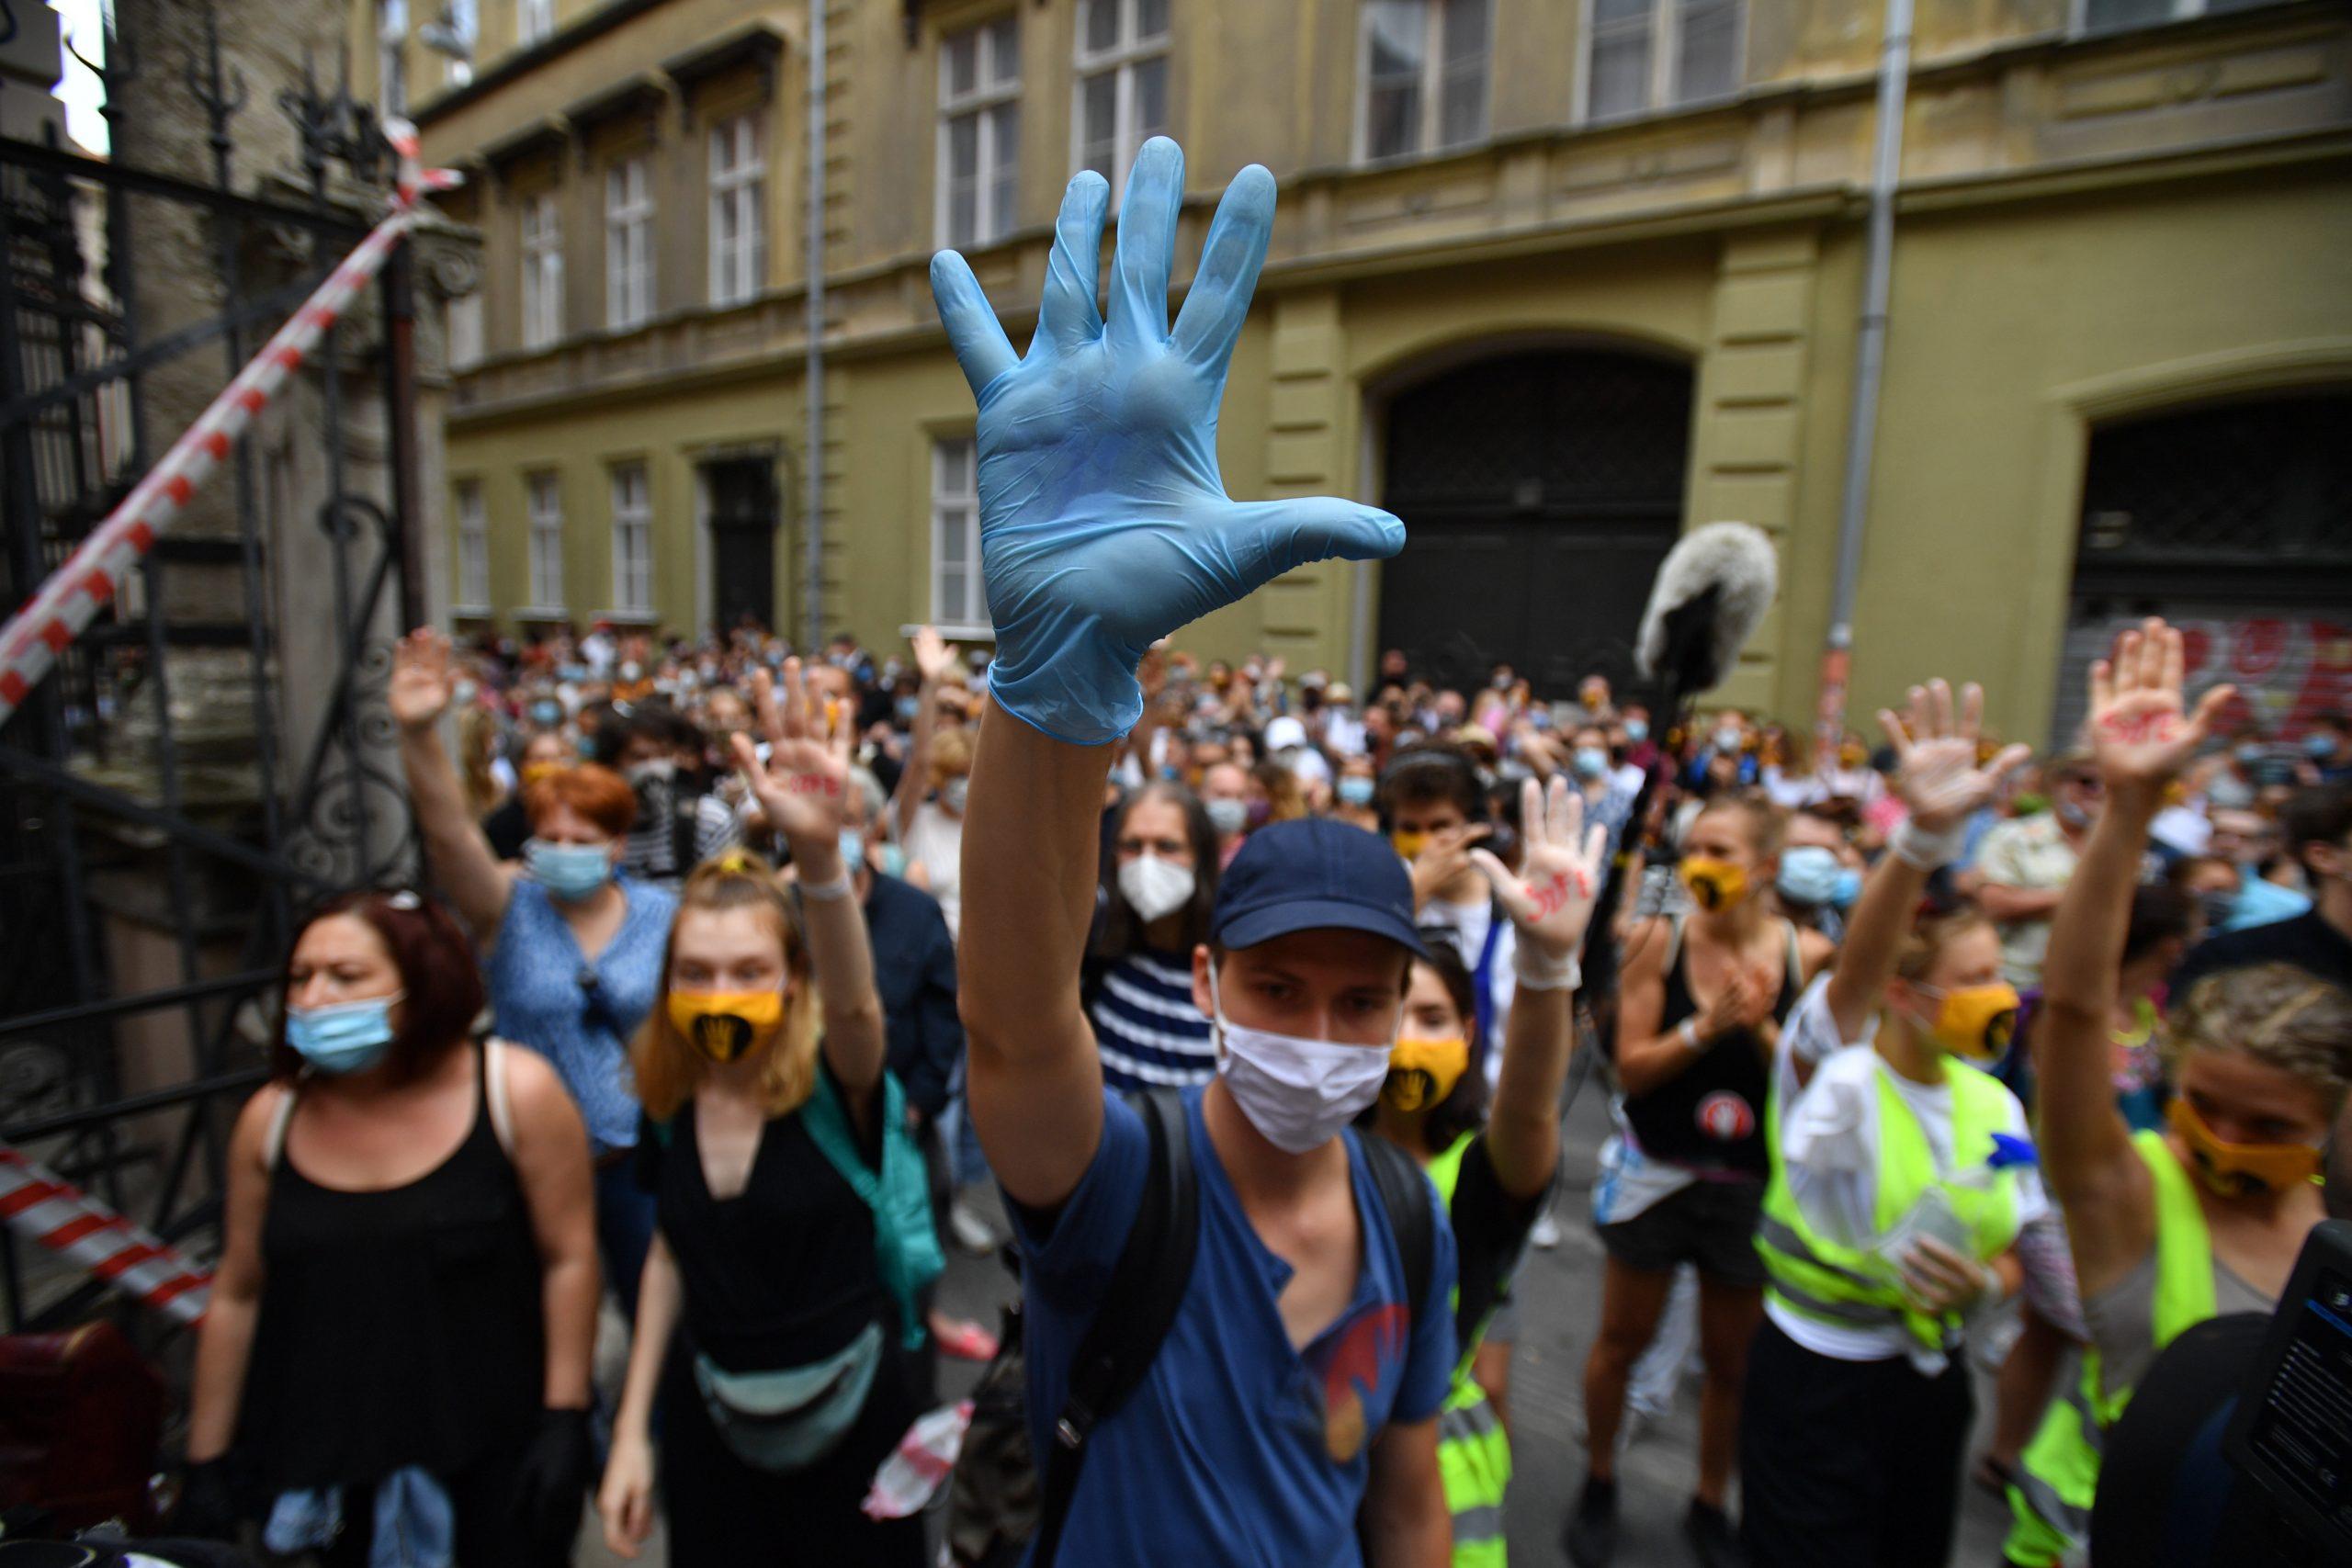 Grünen: Fidesz übt